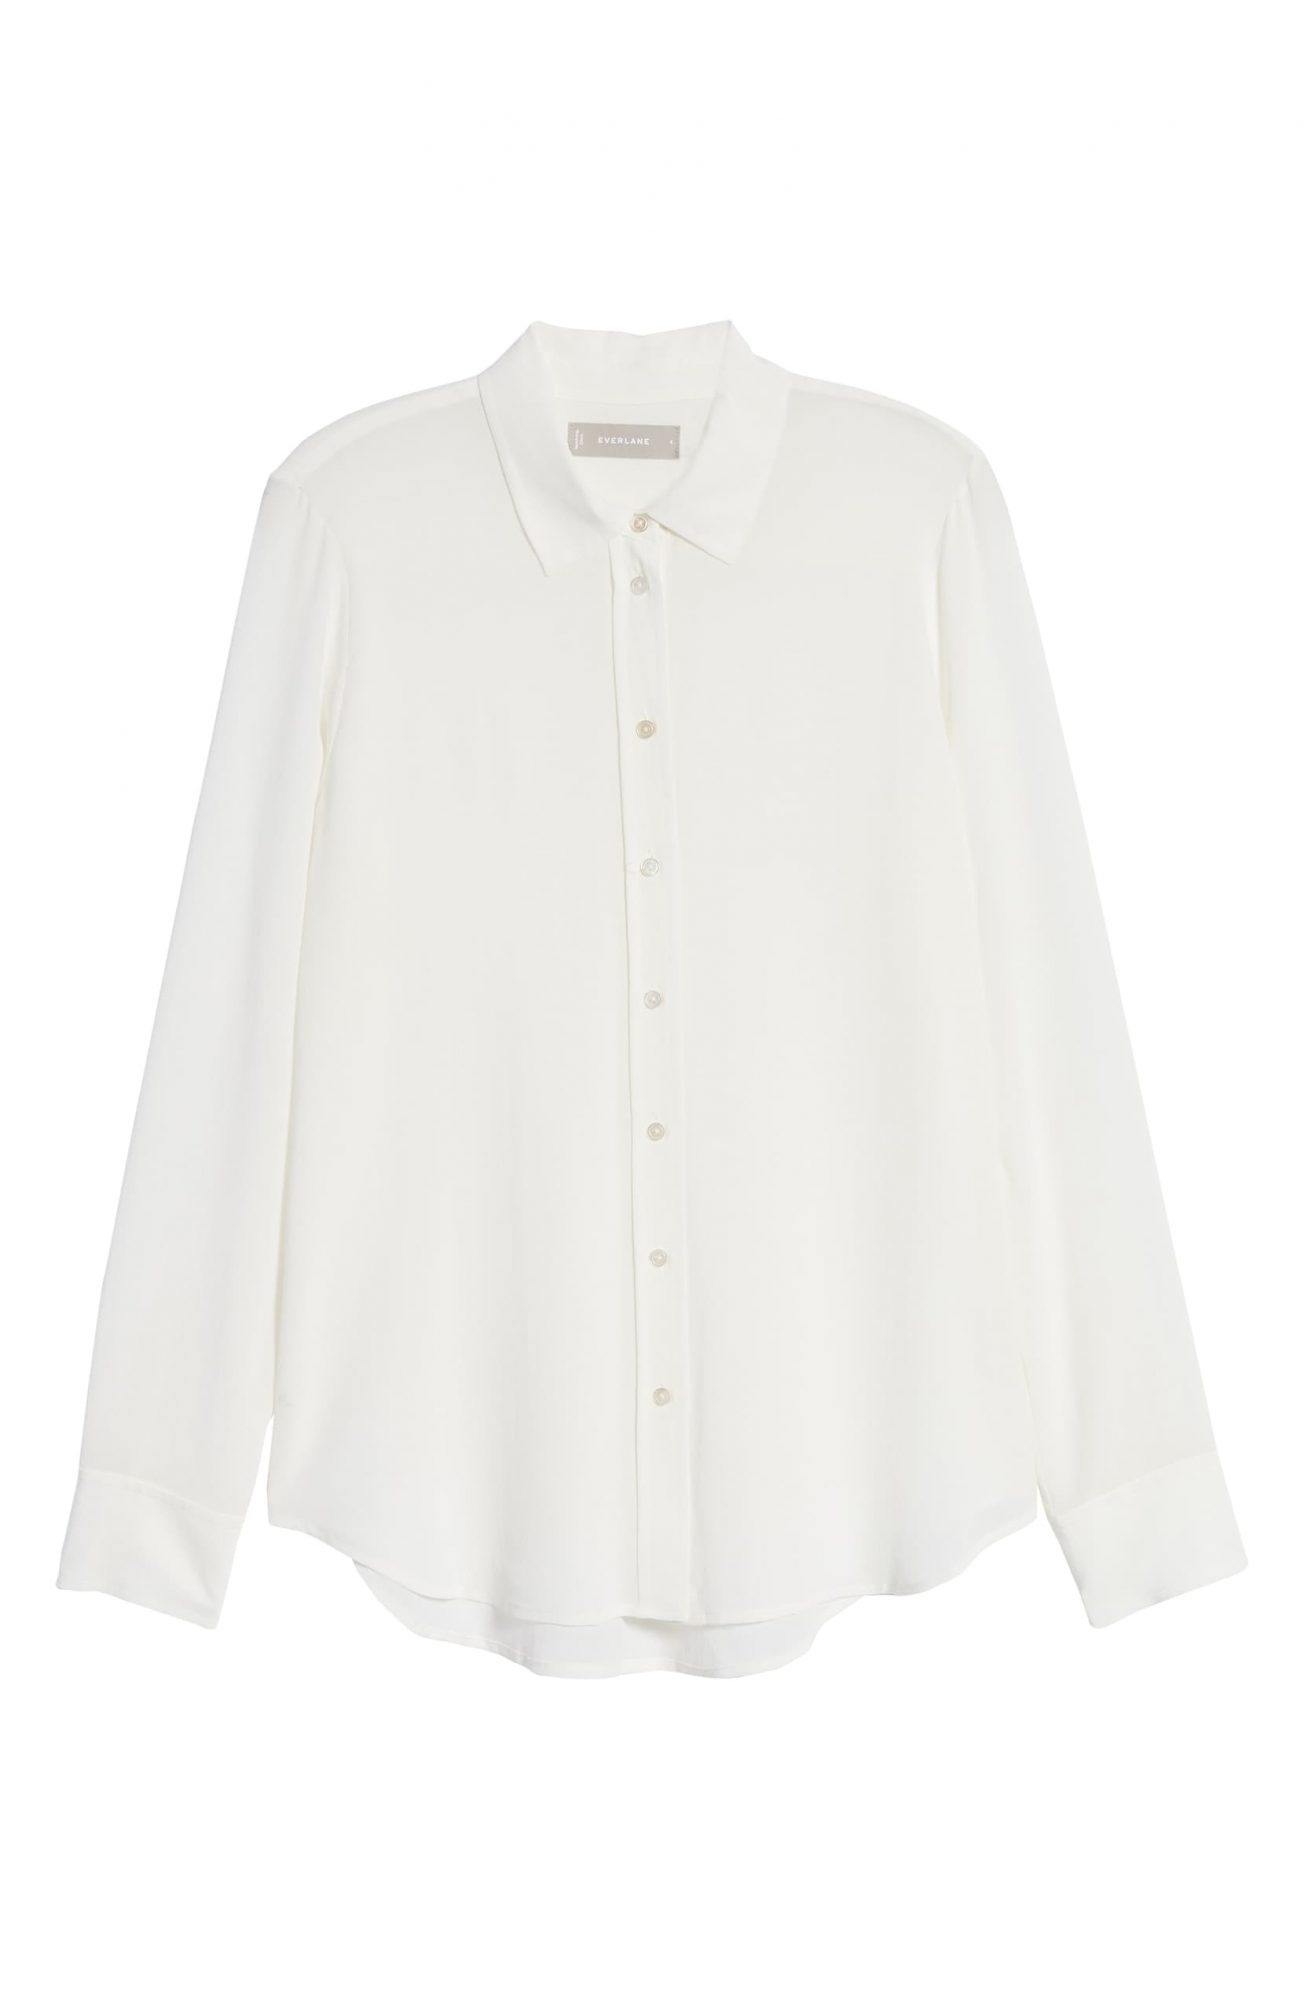 Meghan Markle Everlane shirt